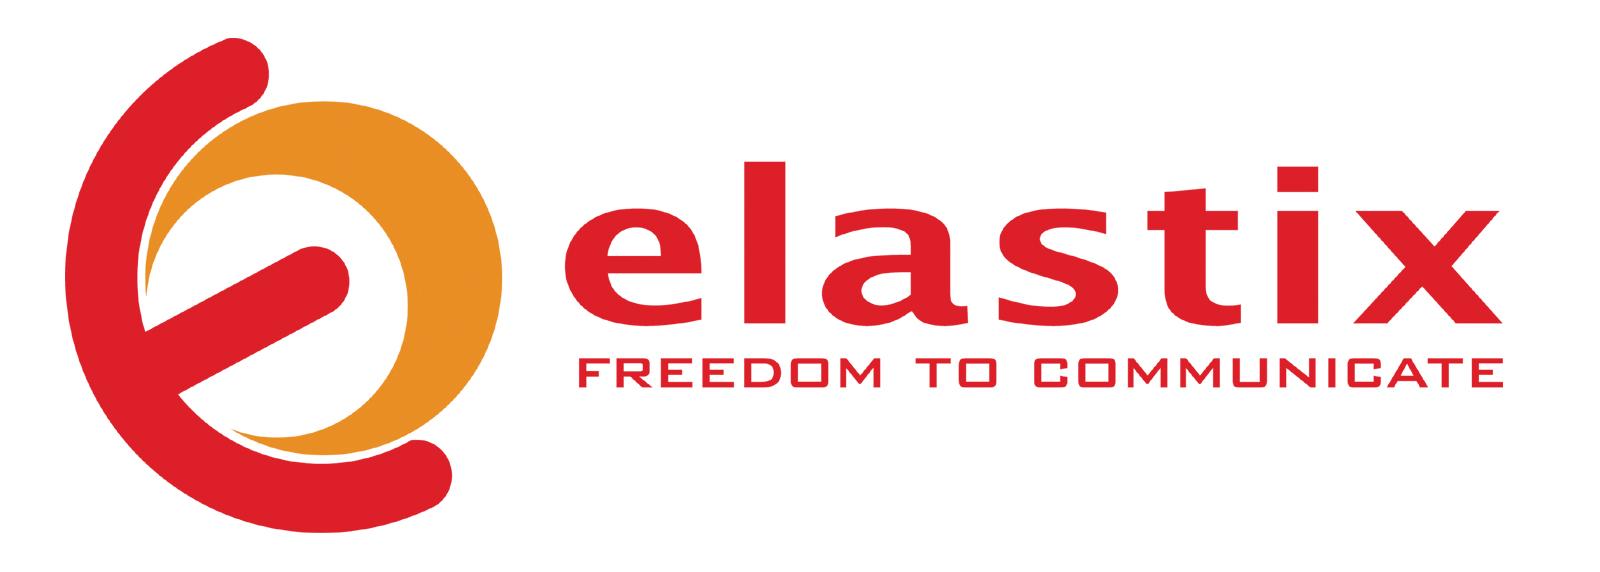 Elastix_logo_1.jpg